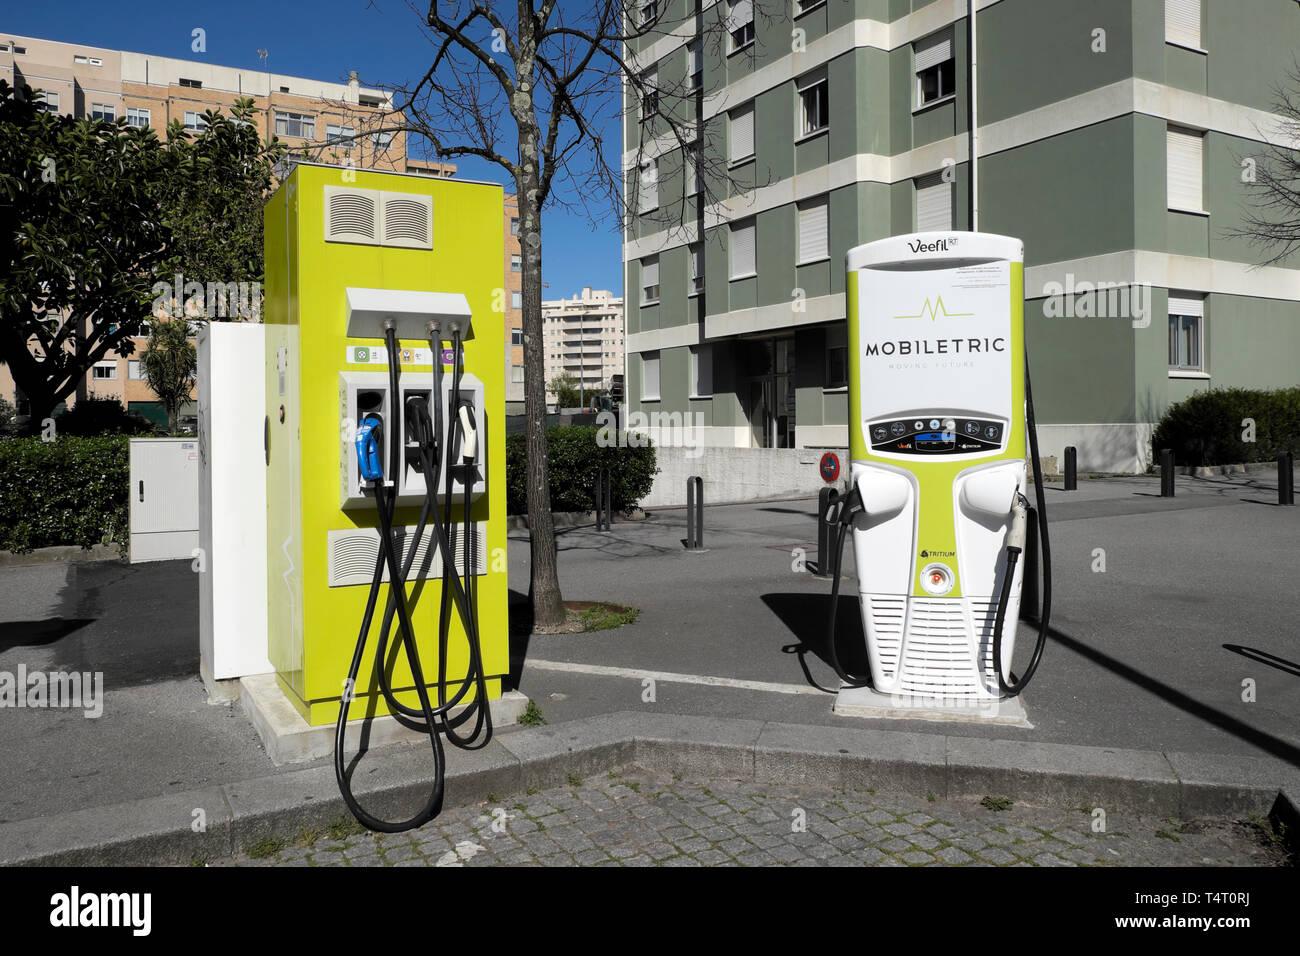 Mobiletric fast charging electric fuel pump station outside an apartment building in Avenida da França Porto Portugal Europe EU  KATHY DEWITT - Stock Image